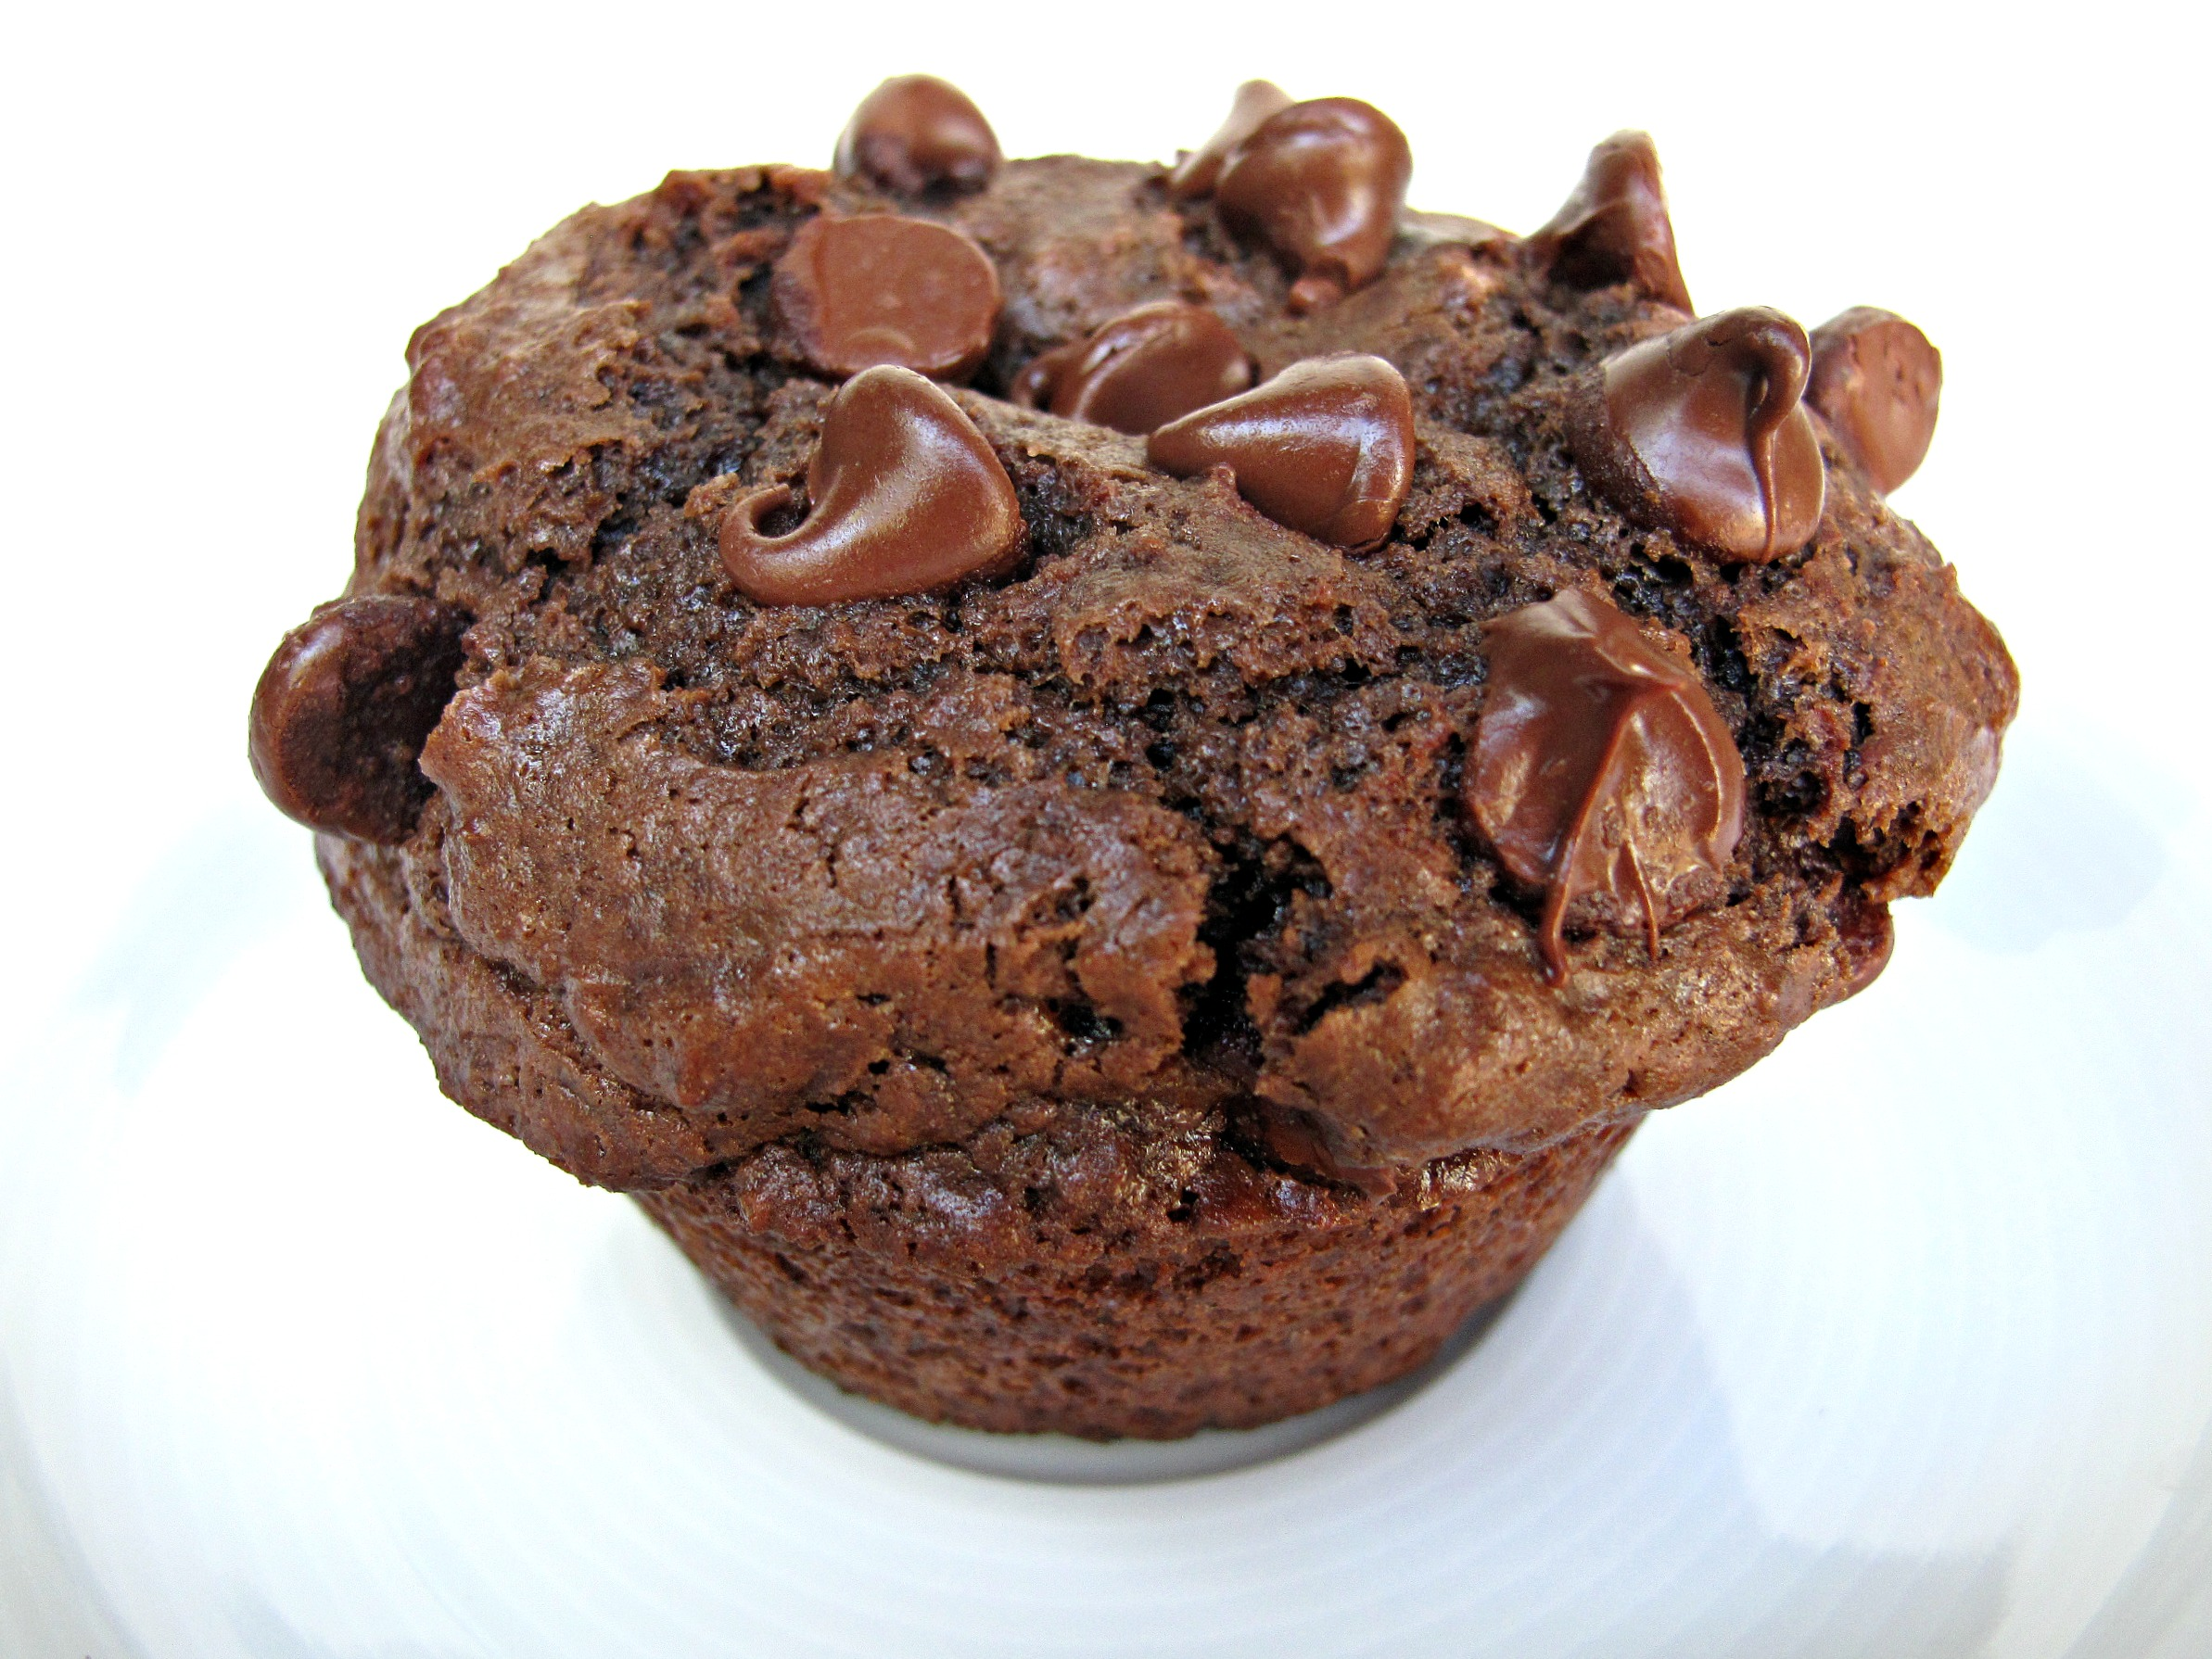 Chocolaty Chip Muffins - The Monday Box